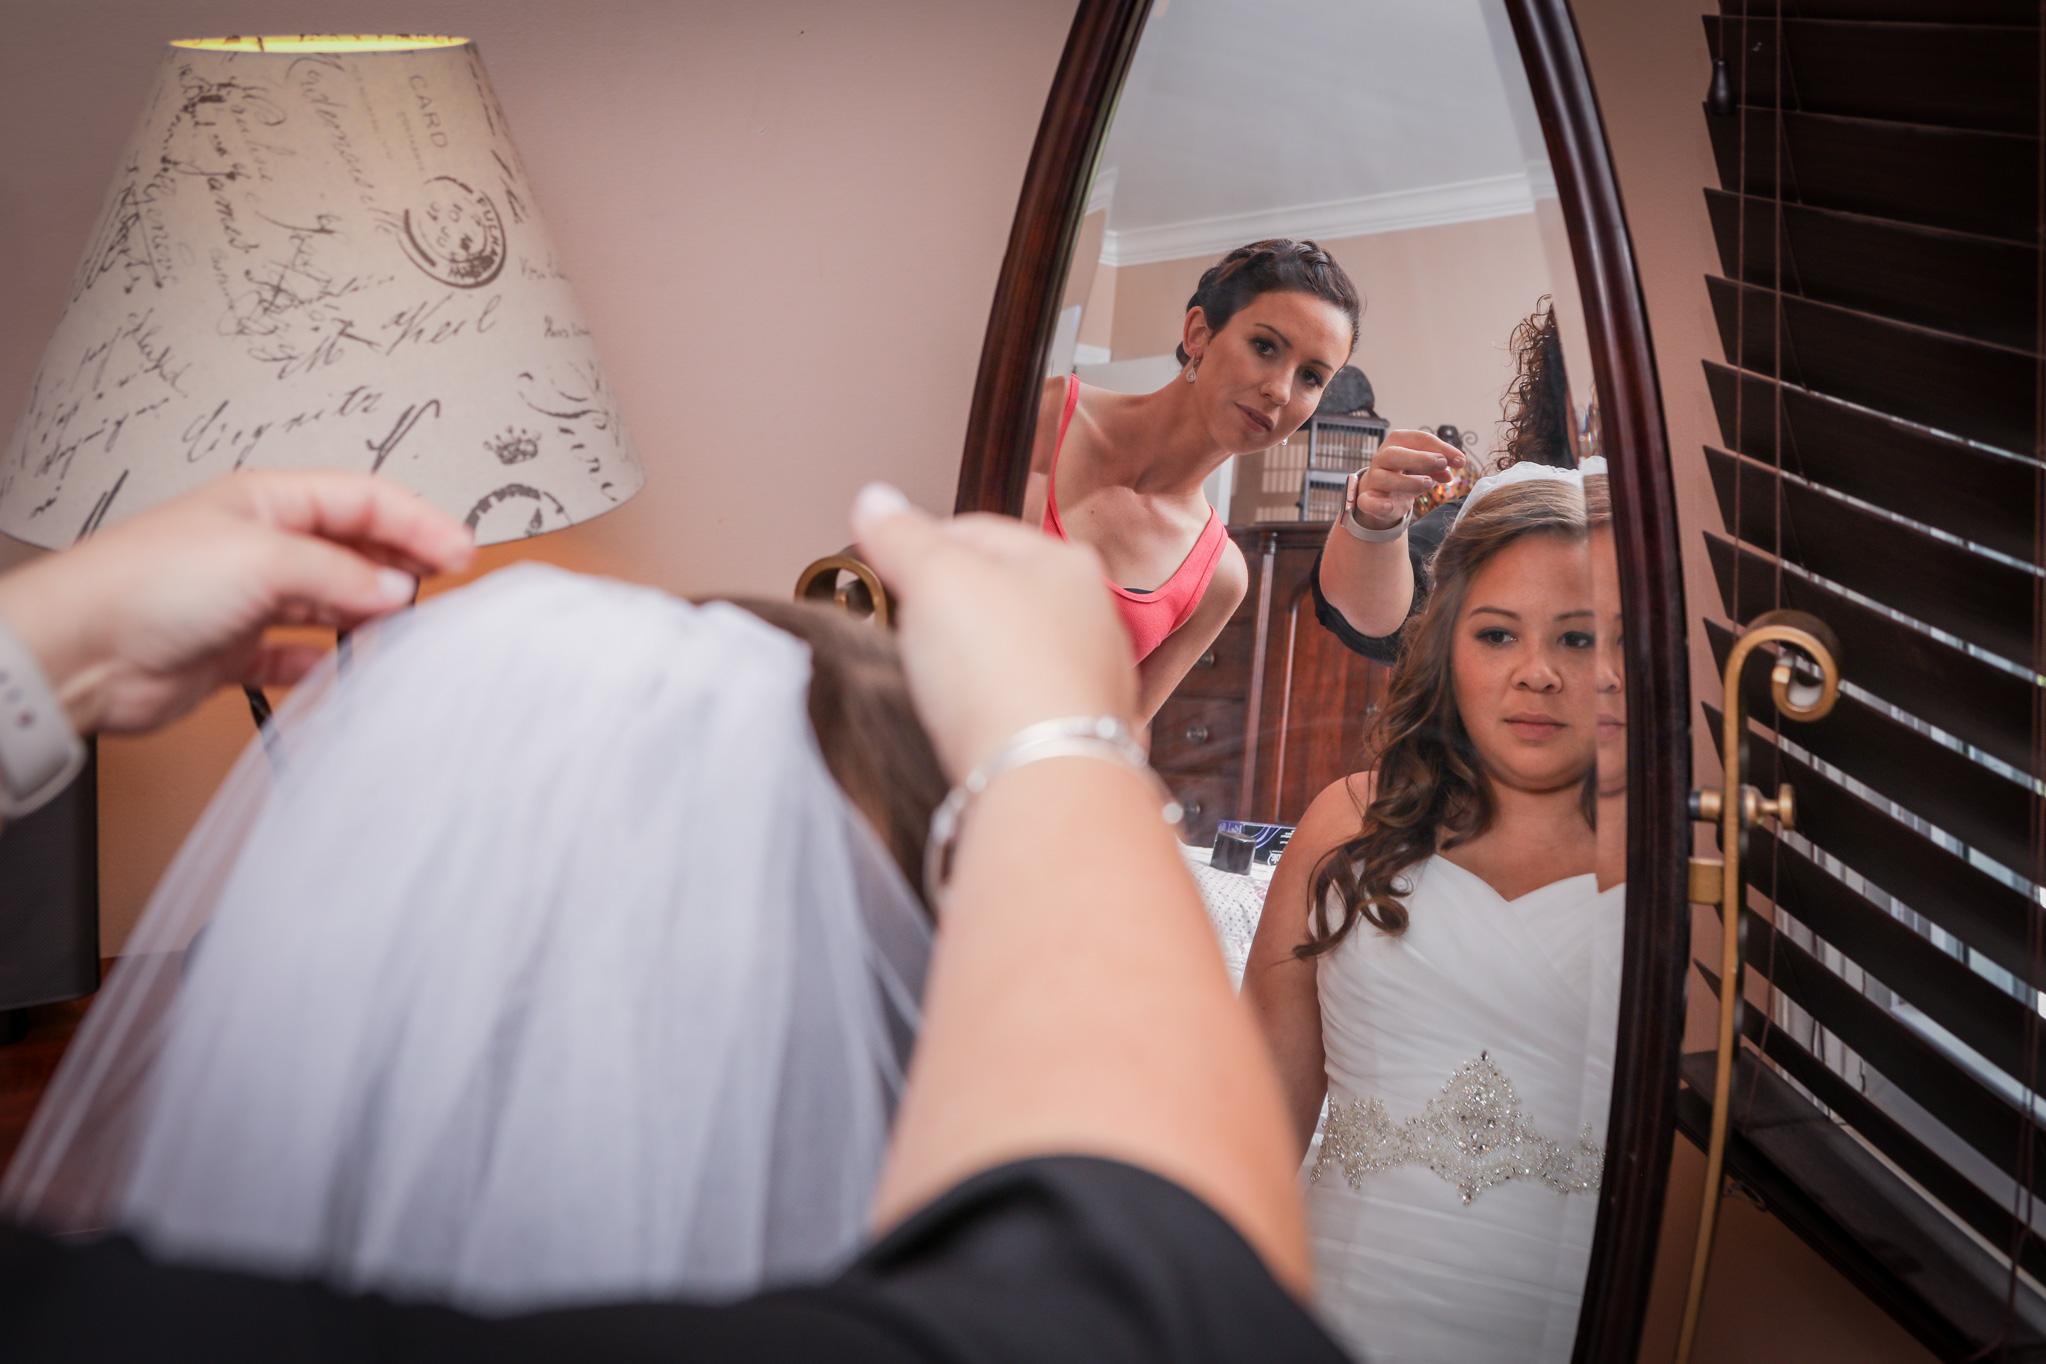 annie_matthew_wedding_cary_illinois_jeff_gathman_photography_5.jpg